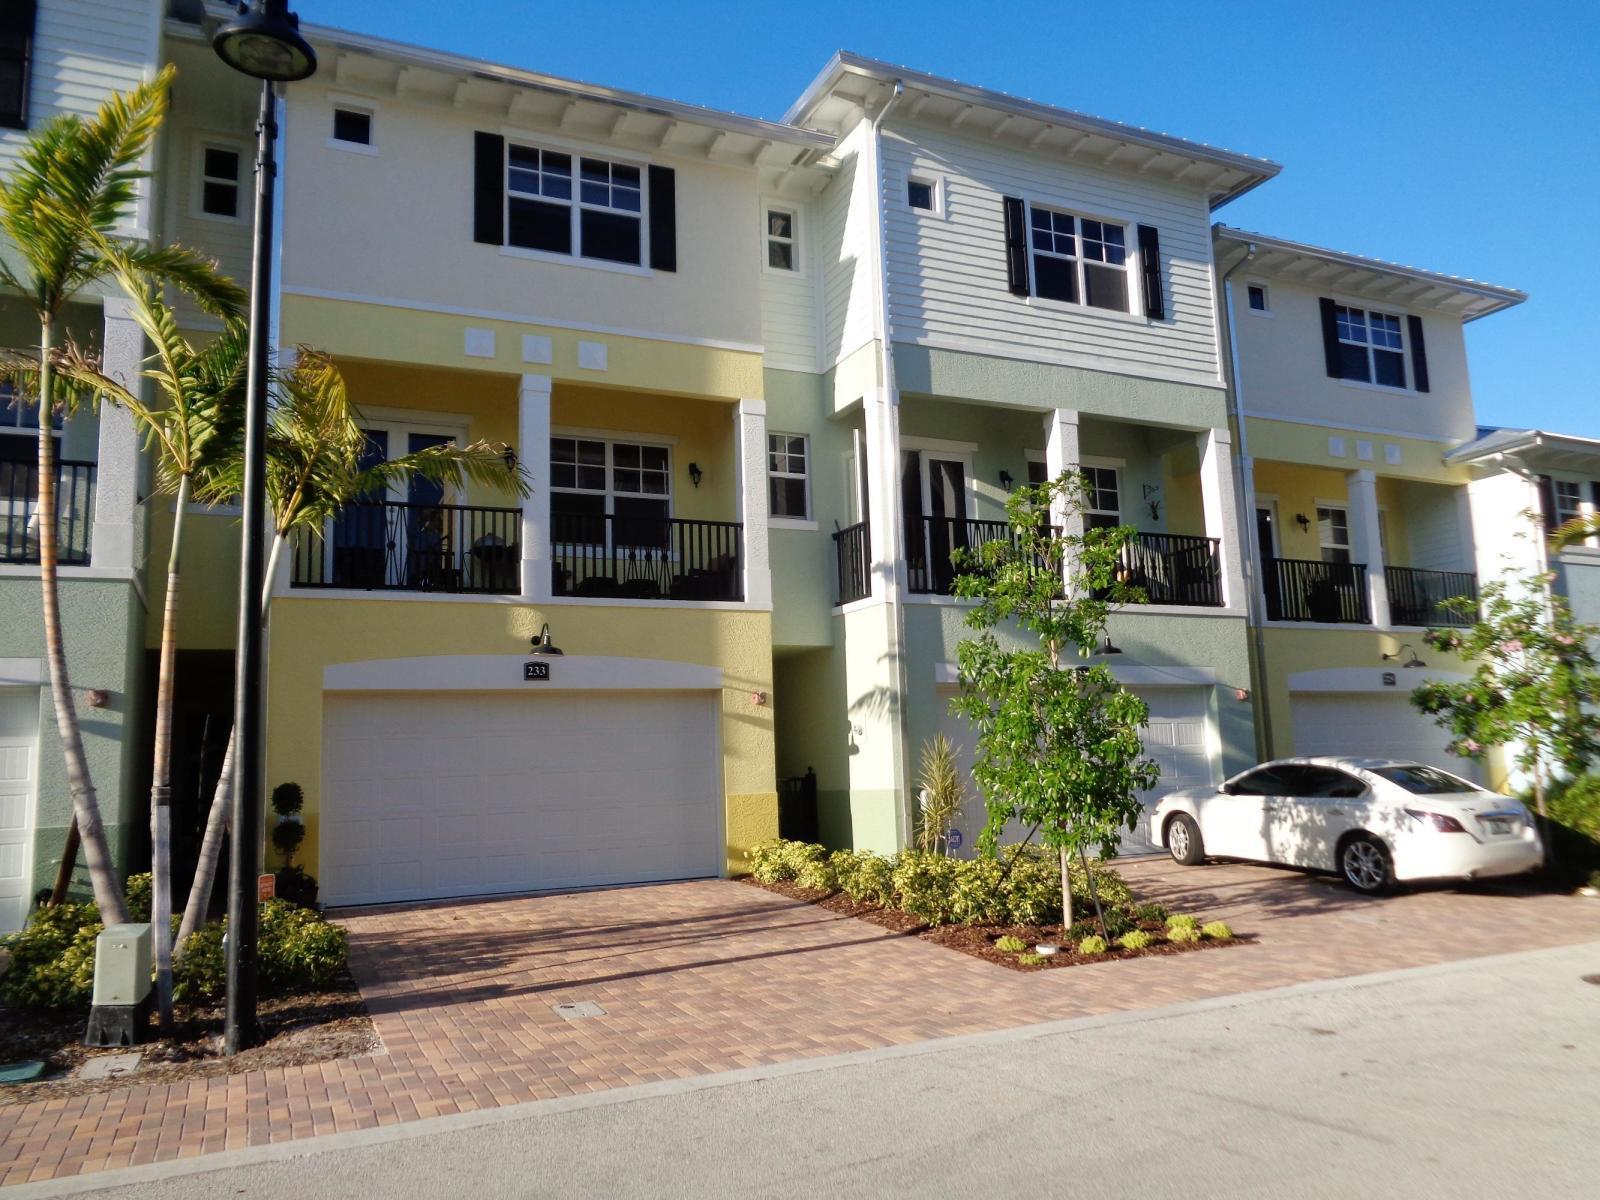 233 Latitude Circle, Delray Beach, Florida 33483, 4 Bedrooms Bedrooms, ,3 BathroomsBathrooms,Rental,For Rent,Latitude,RX-10618778